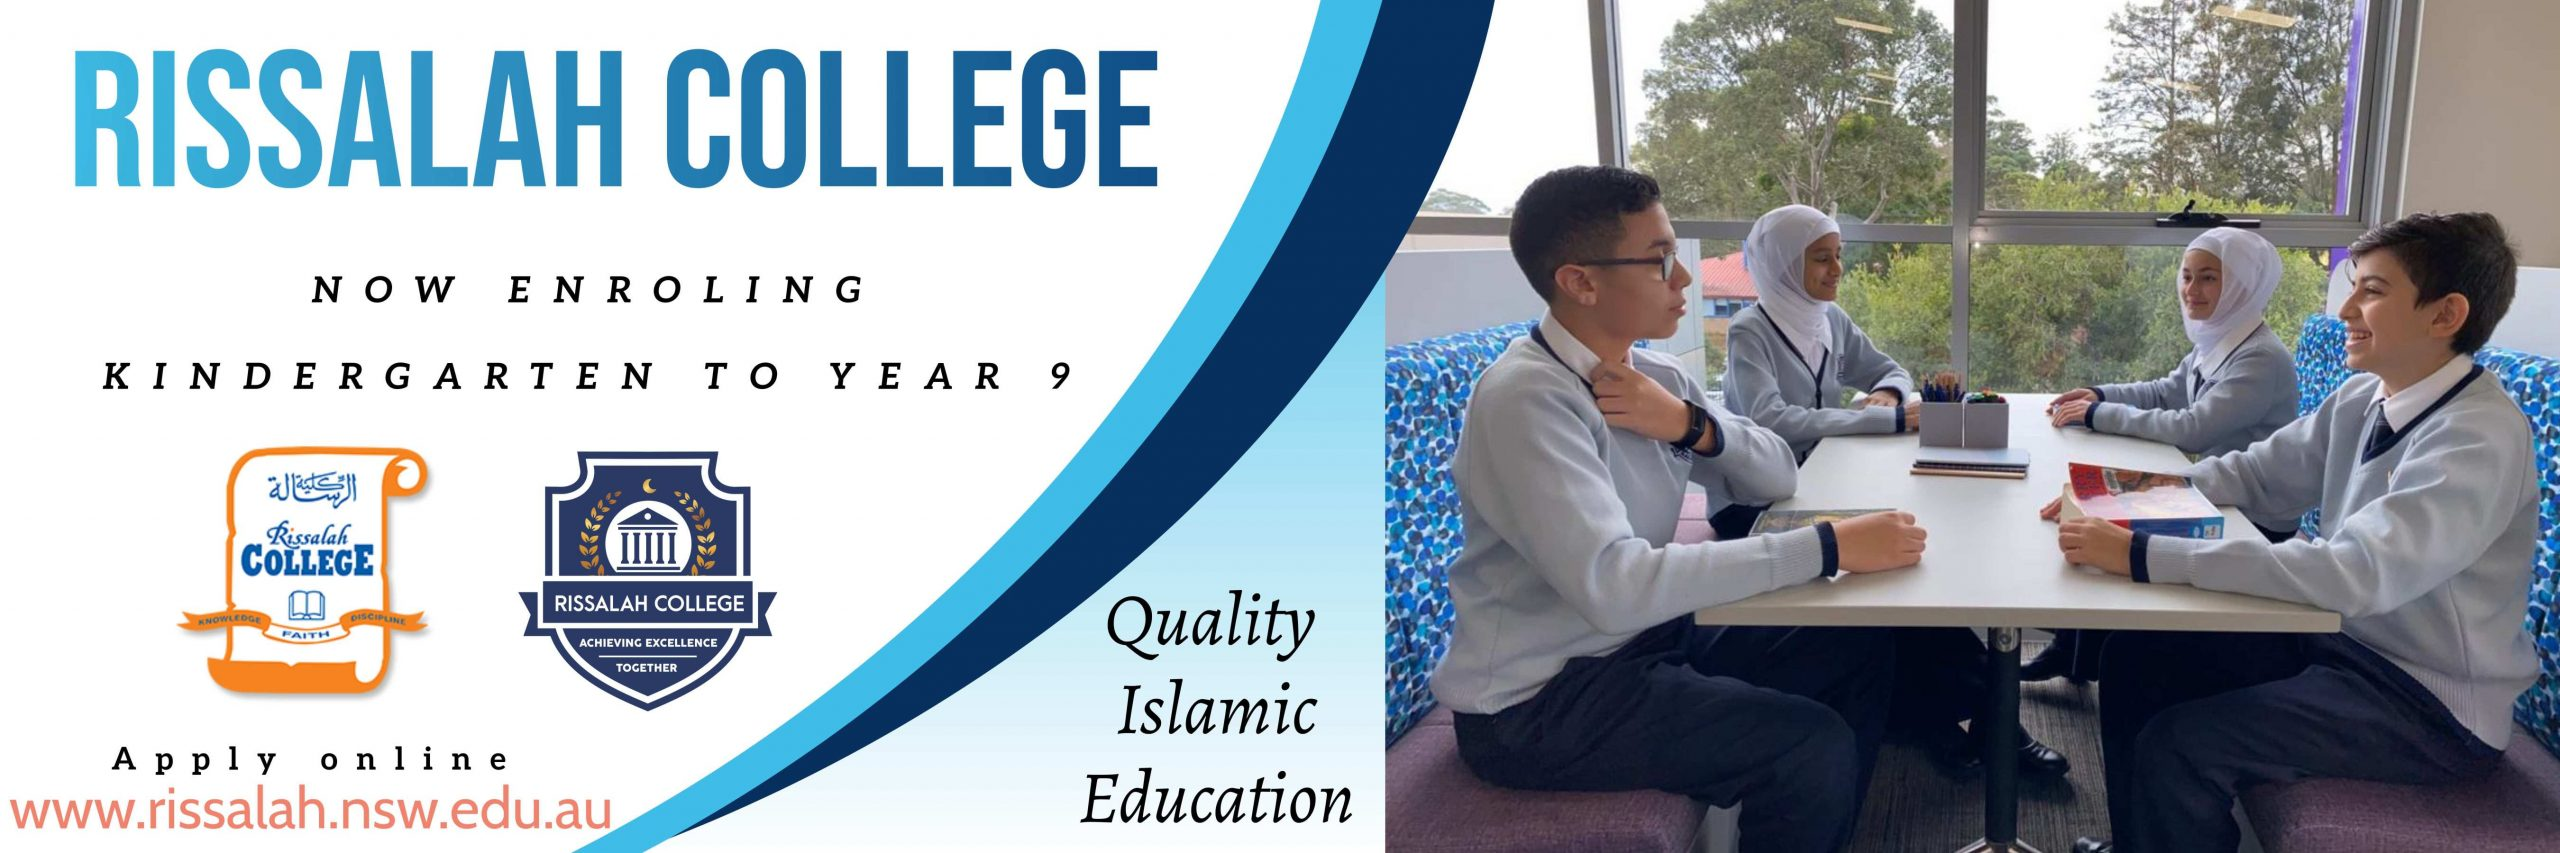 Rissalah College K 9 Ad 2